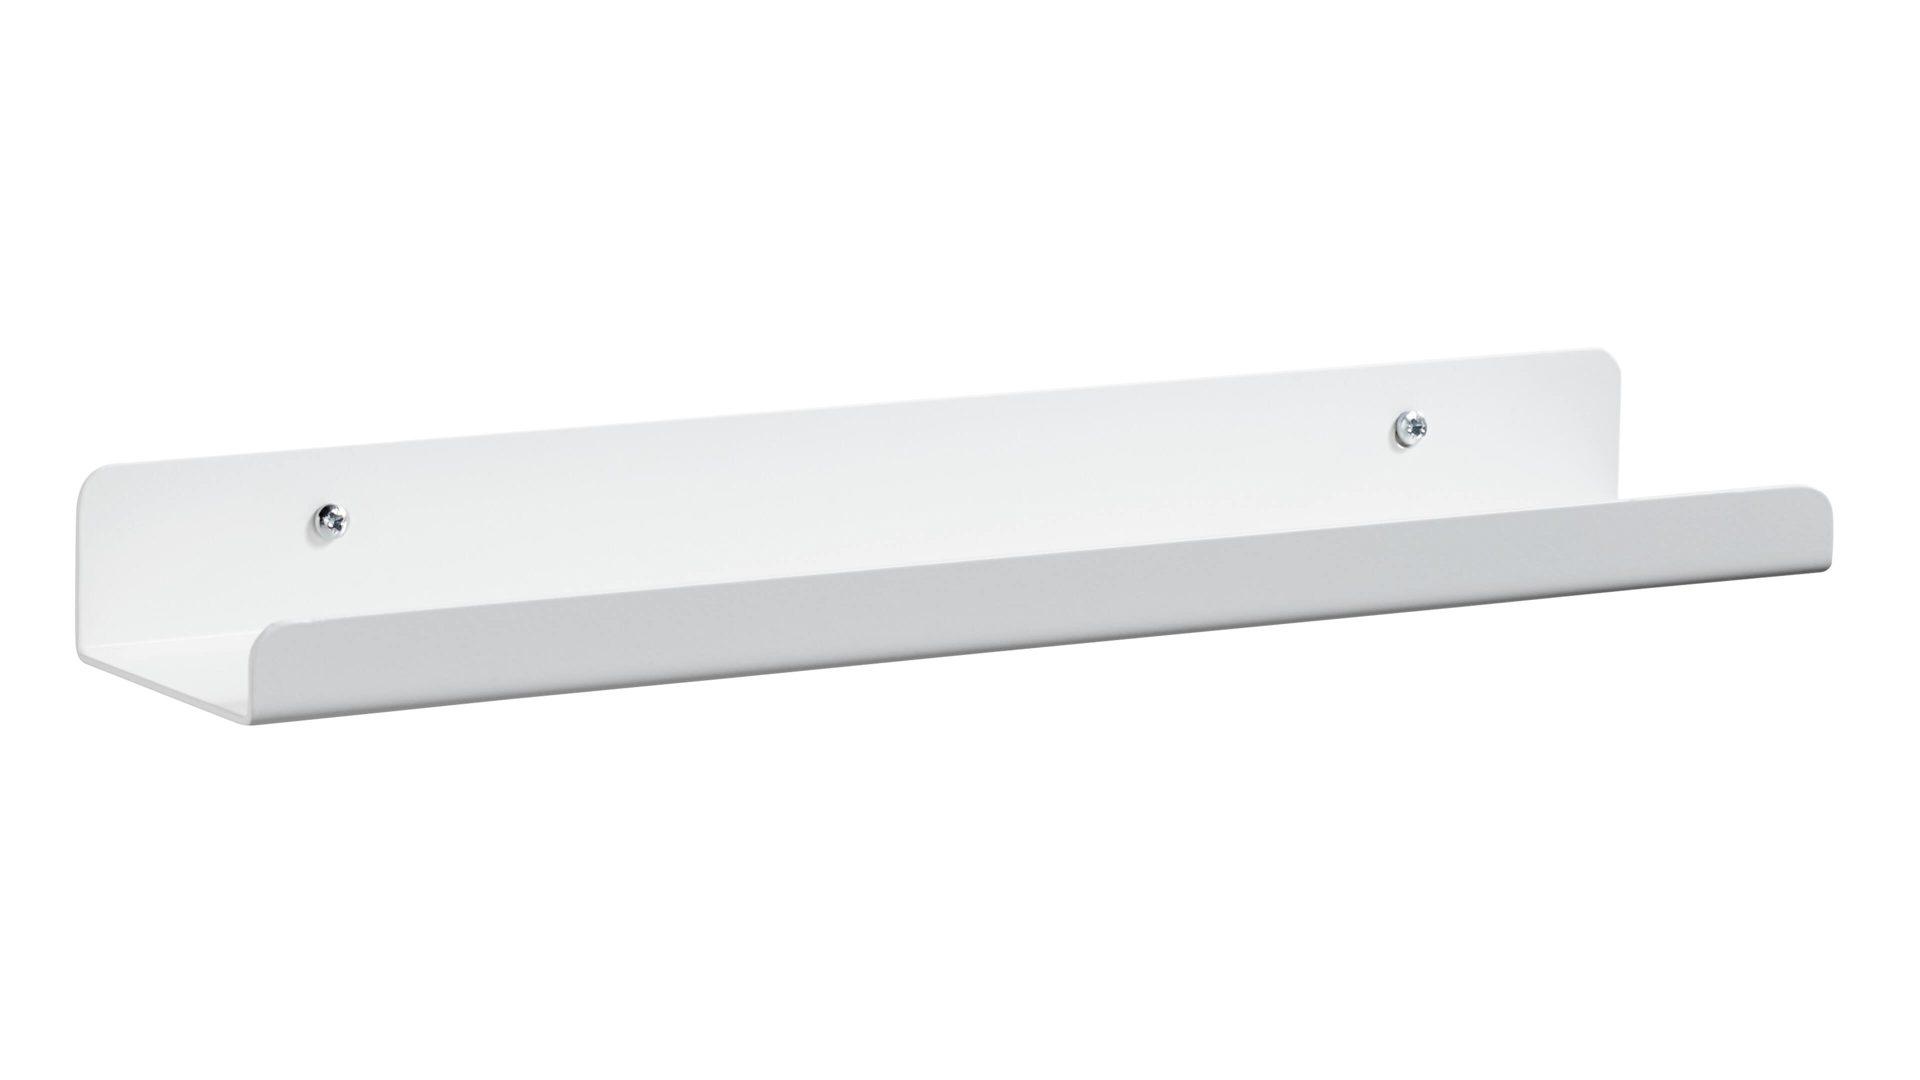 FLEXA Metall-Wandregal, weißes Metall – Länge ca. 40 cm, Bad Homburg ...